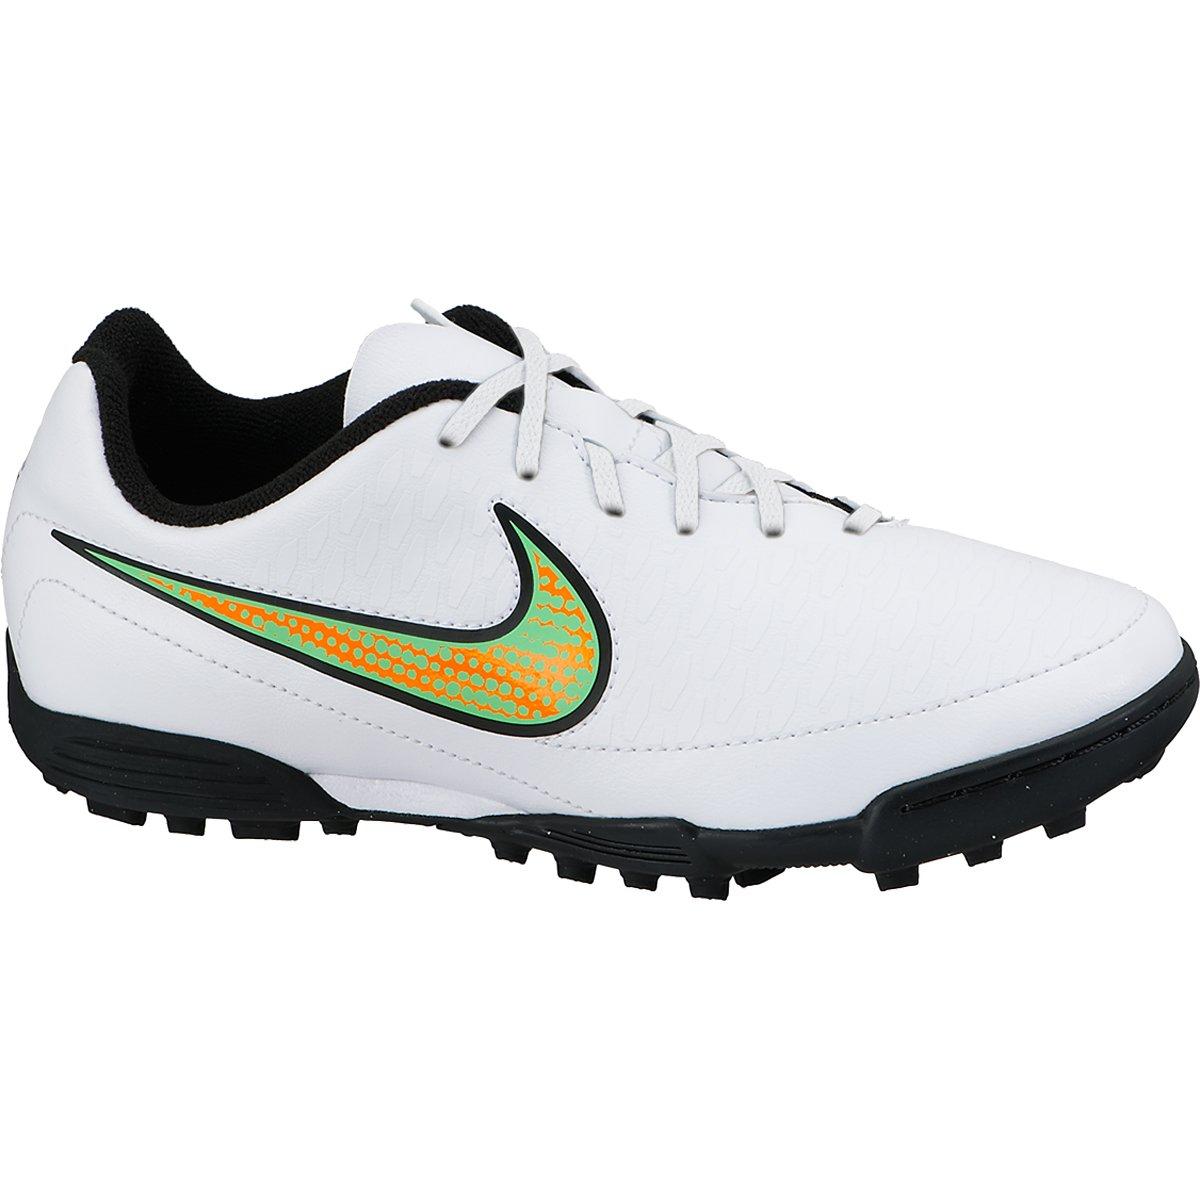 73c6a3d290 Chuteira Nike Magista Ola TF Society Infantil - Compre Agora